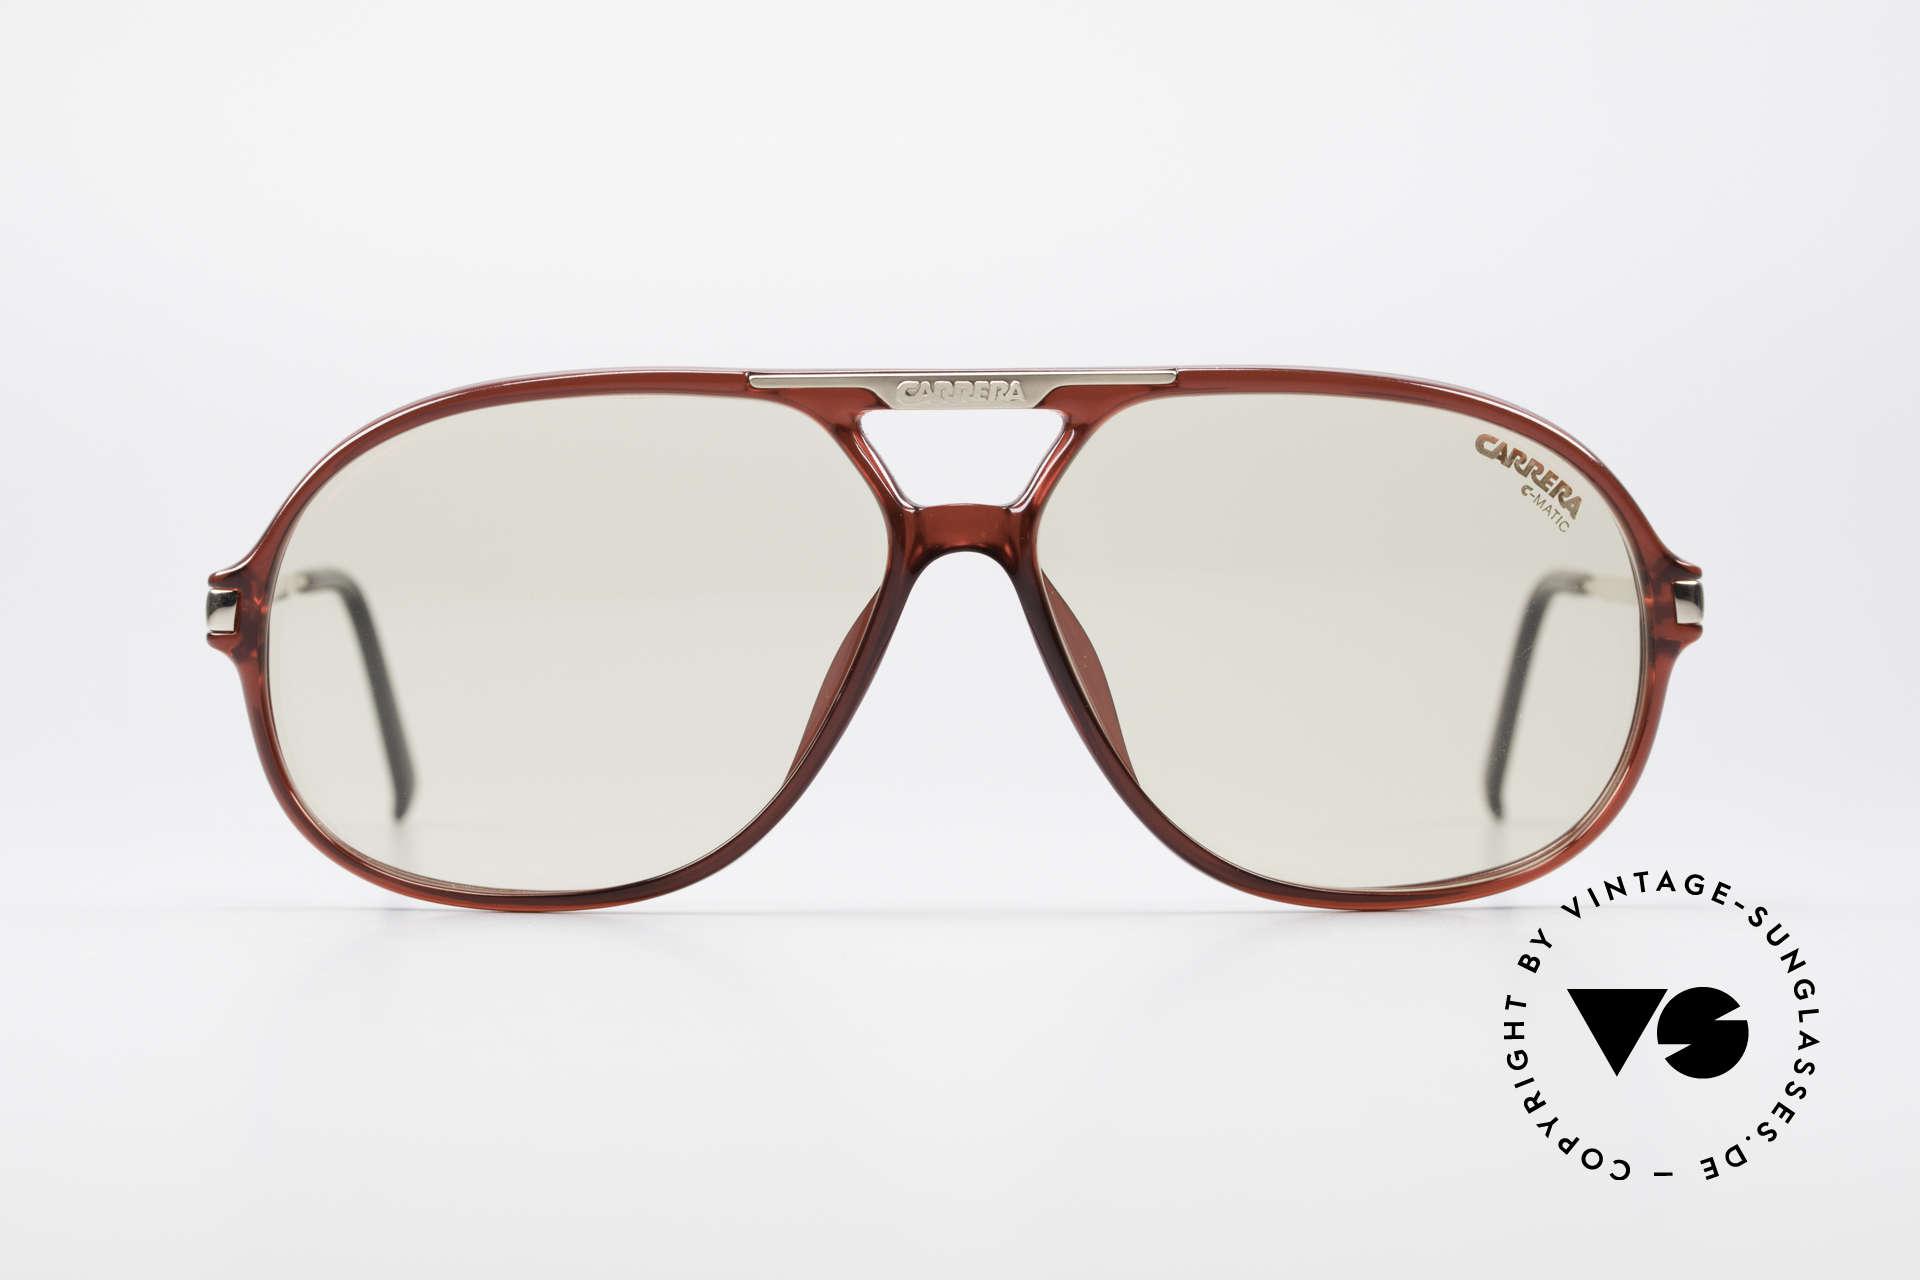 "Carrera 5411 C-Matic Extra Changeable Sun Lenses, brilliant photochromic ""C-MATIC"" lenses (darkening), Made for Men"